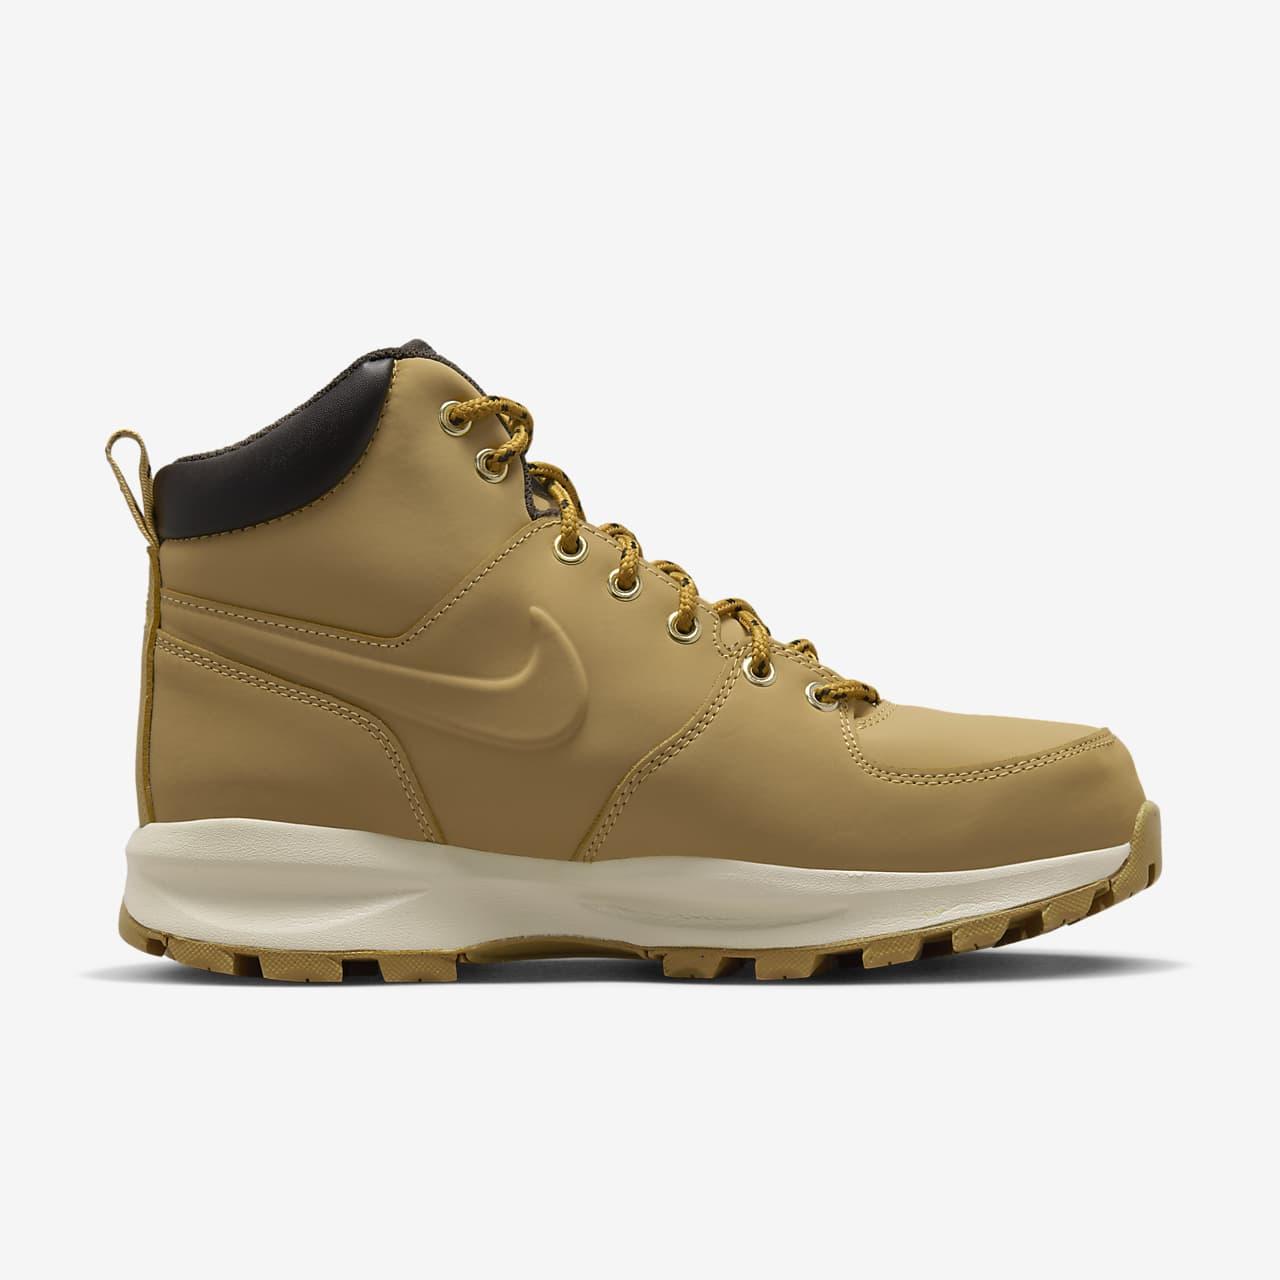 6ef6c339d2 Low Resolution Nike Manoa Men's Boot Nike Manoa Men's Boot